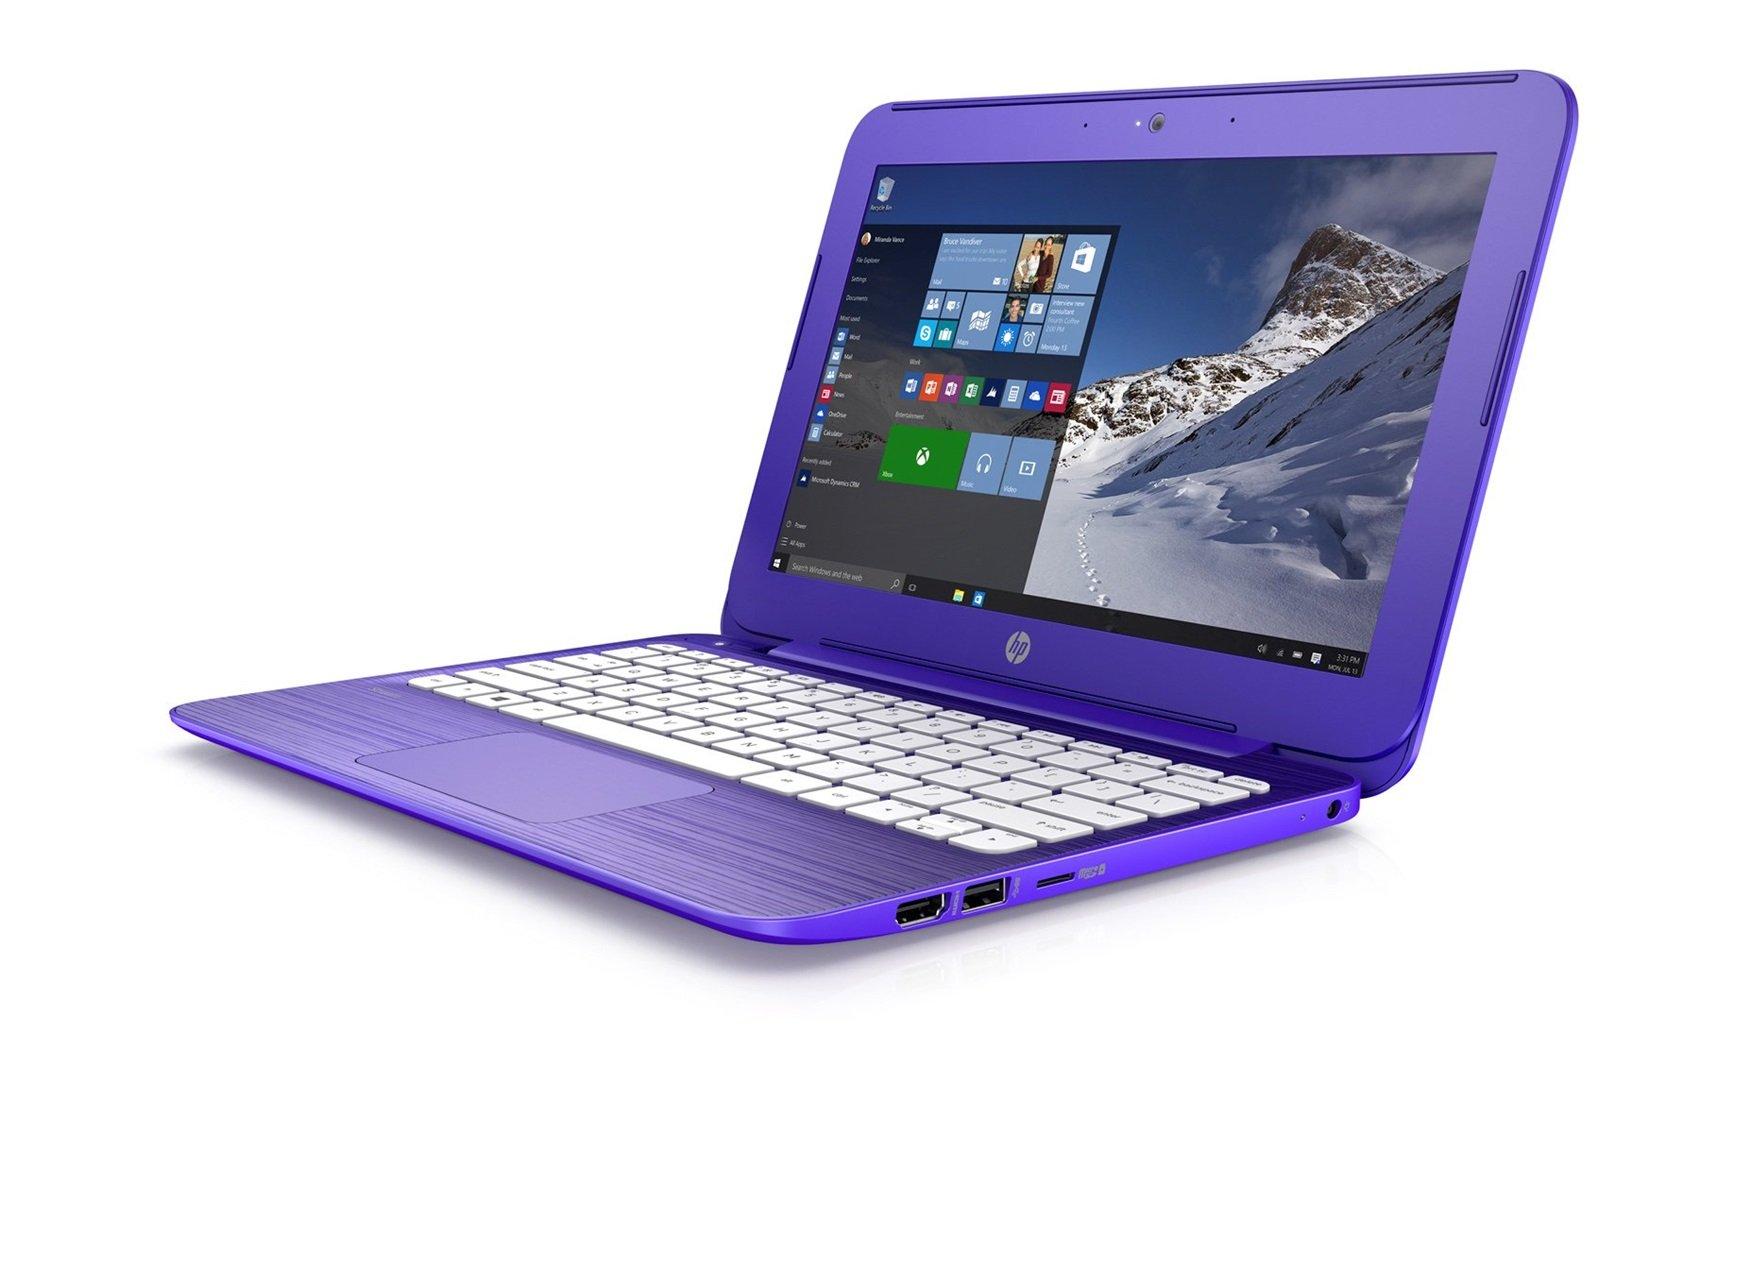 2016 HP Stream 11 11.6 inch Laptop (Intel Celeron N3050 1.6GHz, 2GB RAM, 32GB Solid State Drive, Windows 10 Home) Purple (Certified Refurbished)